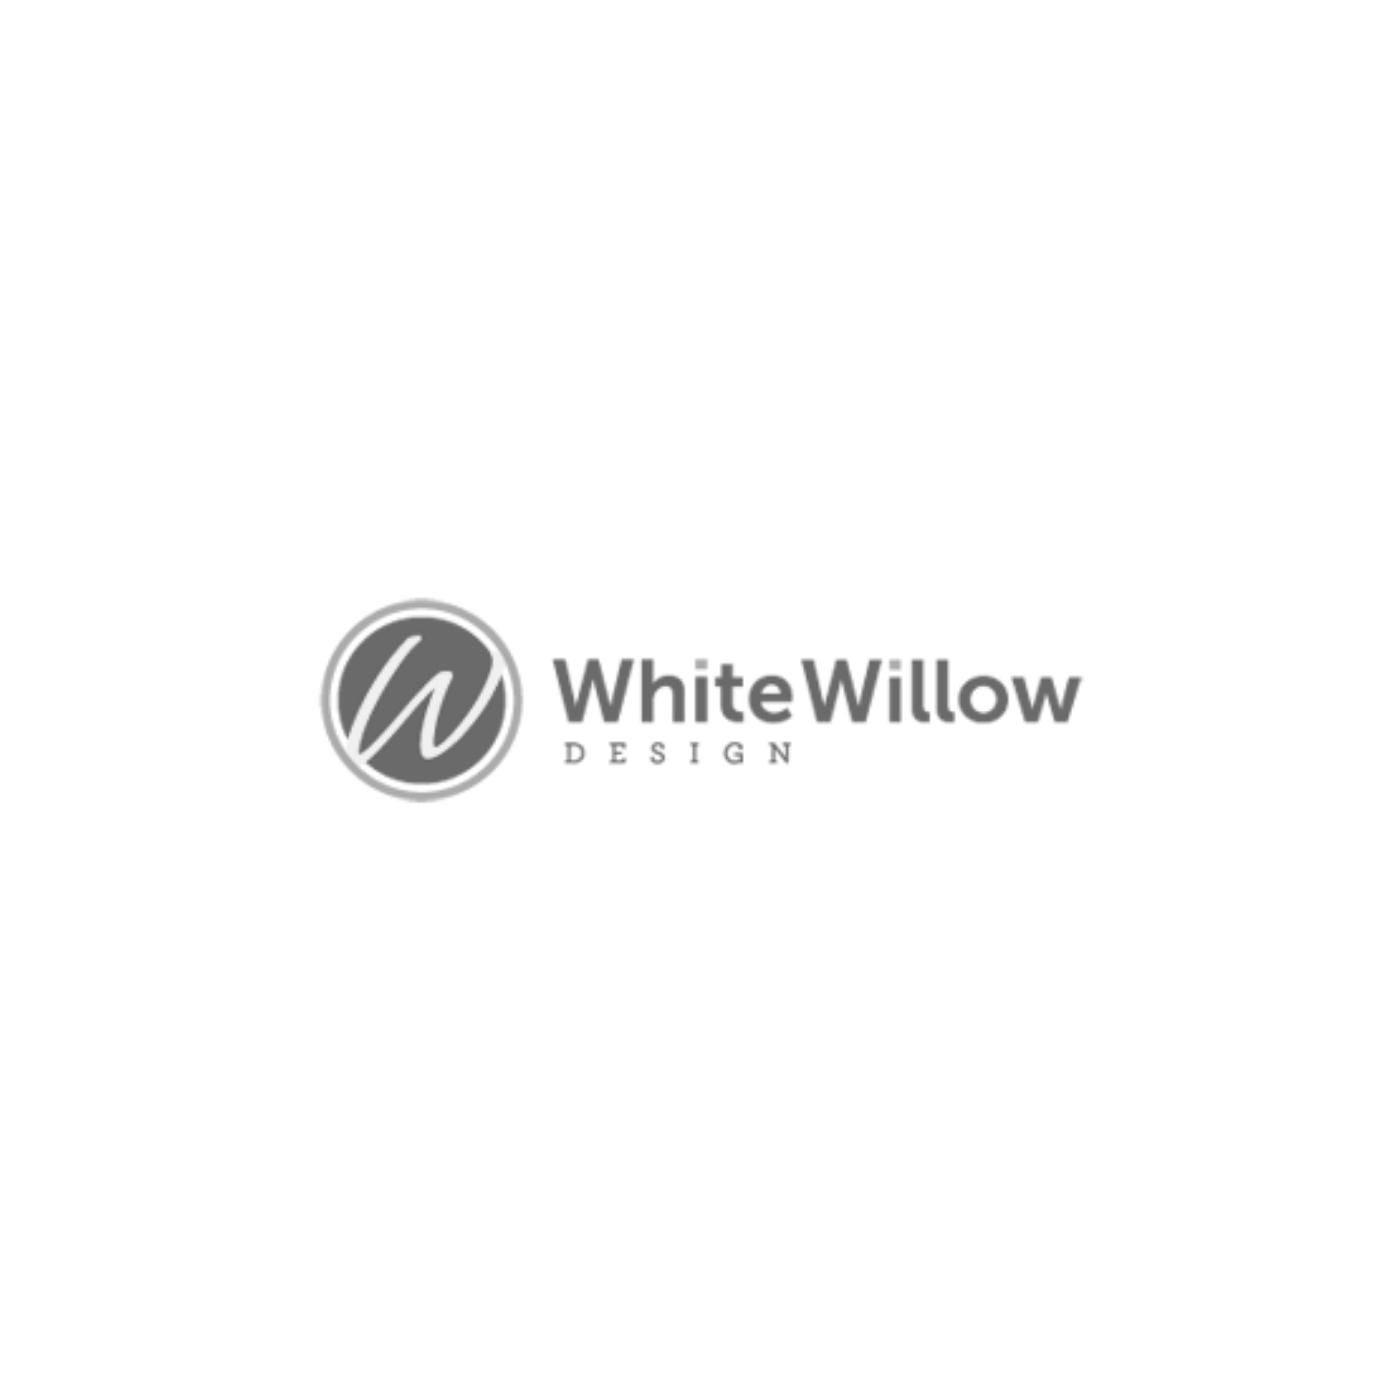 WhiteWillow